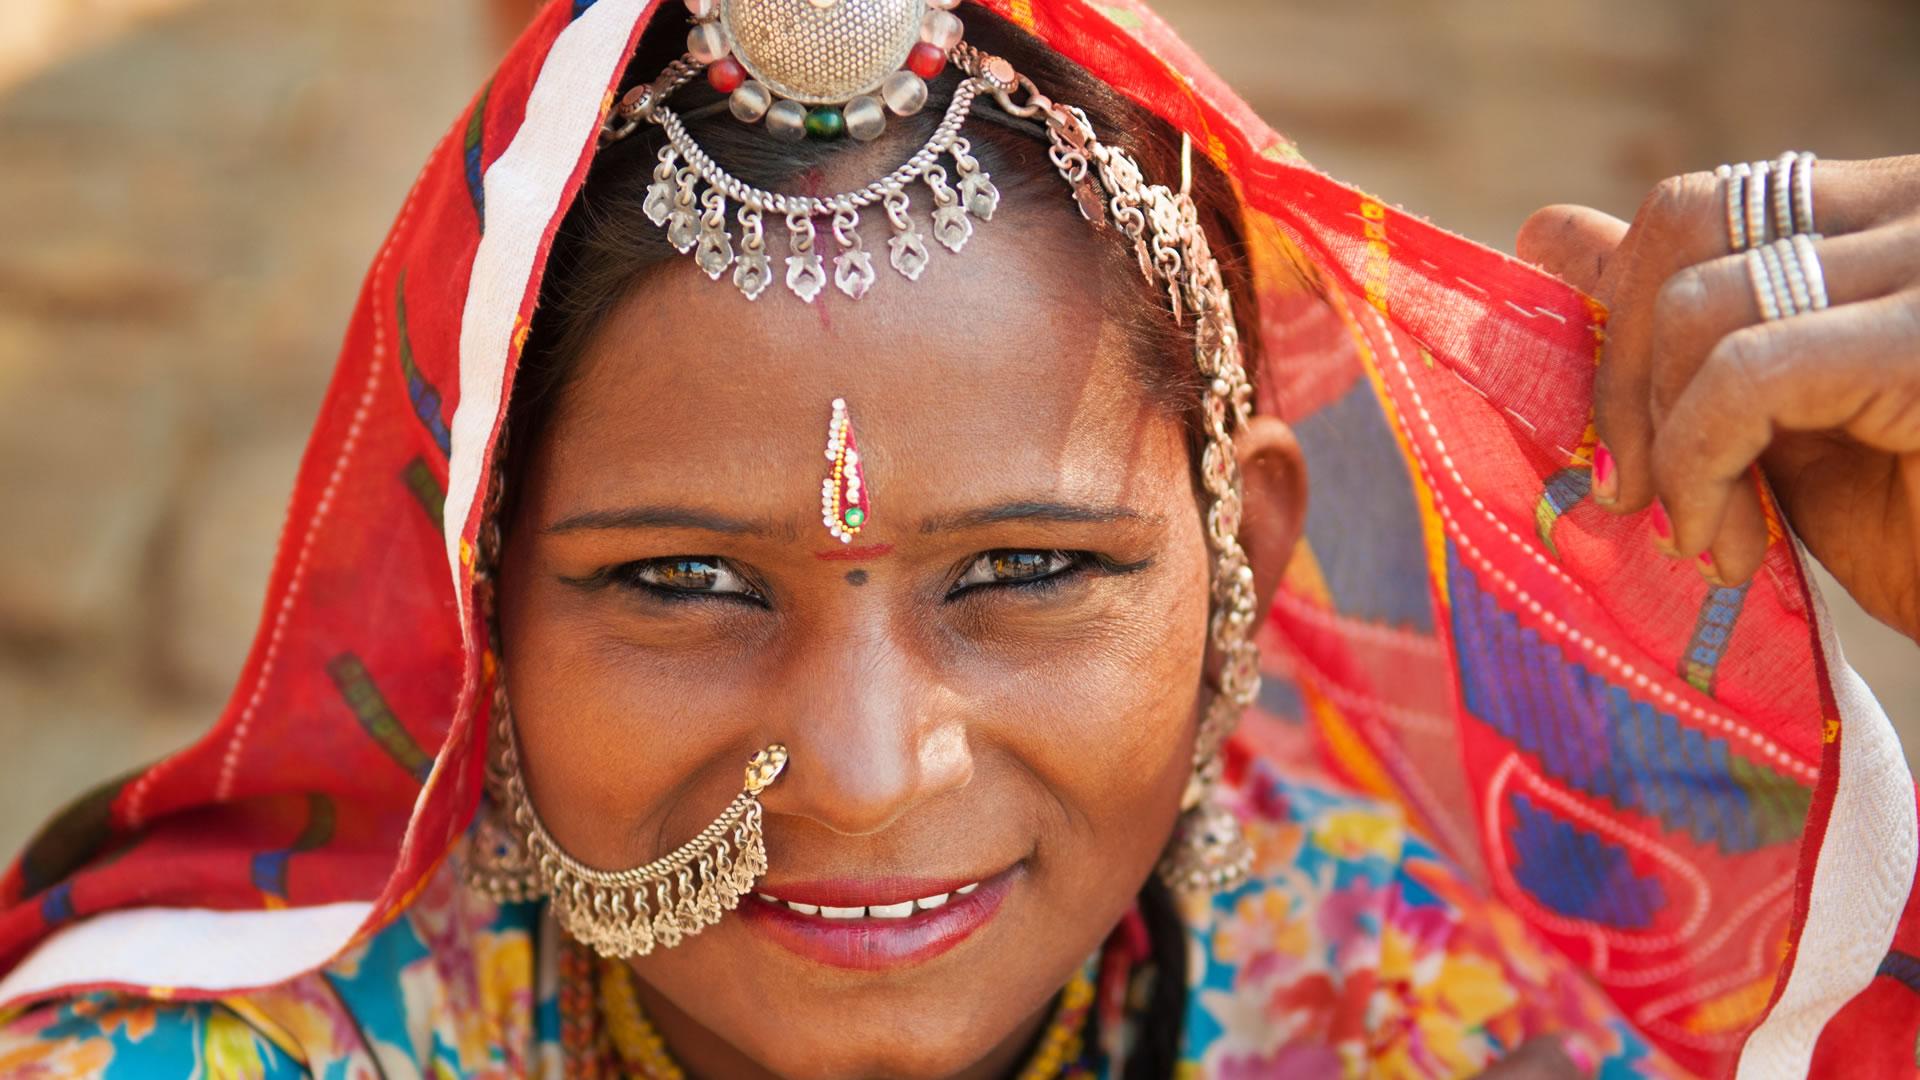 India del Sur 16 Octubre